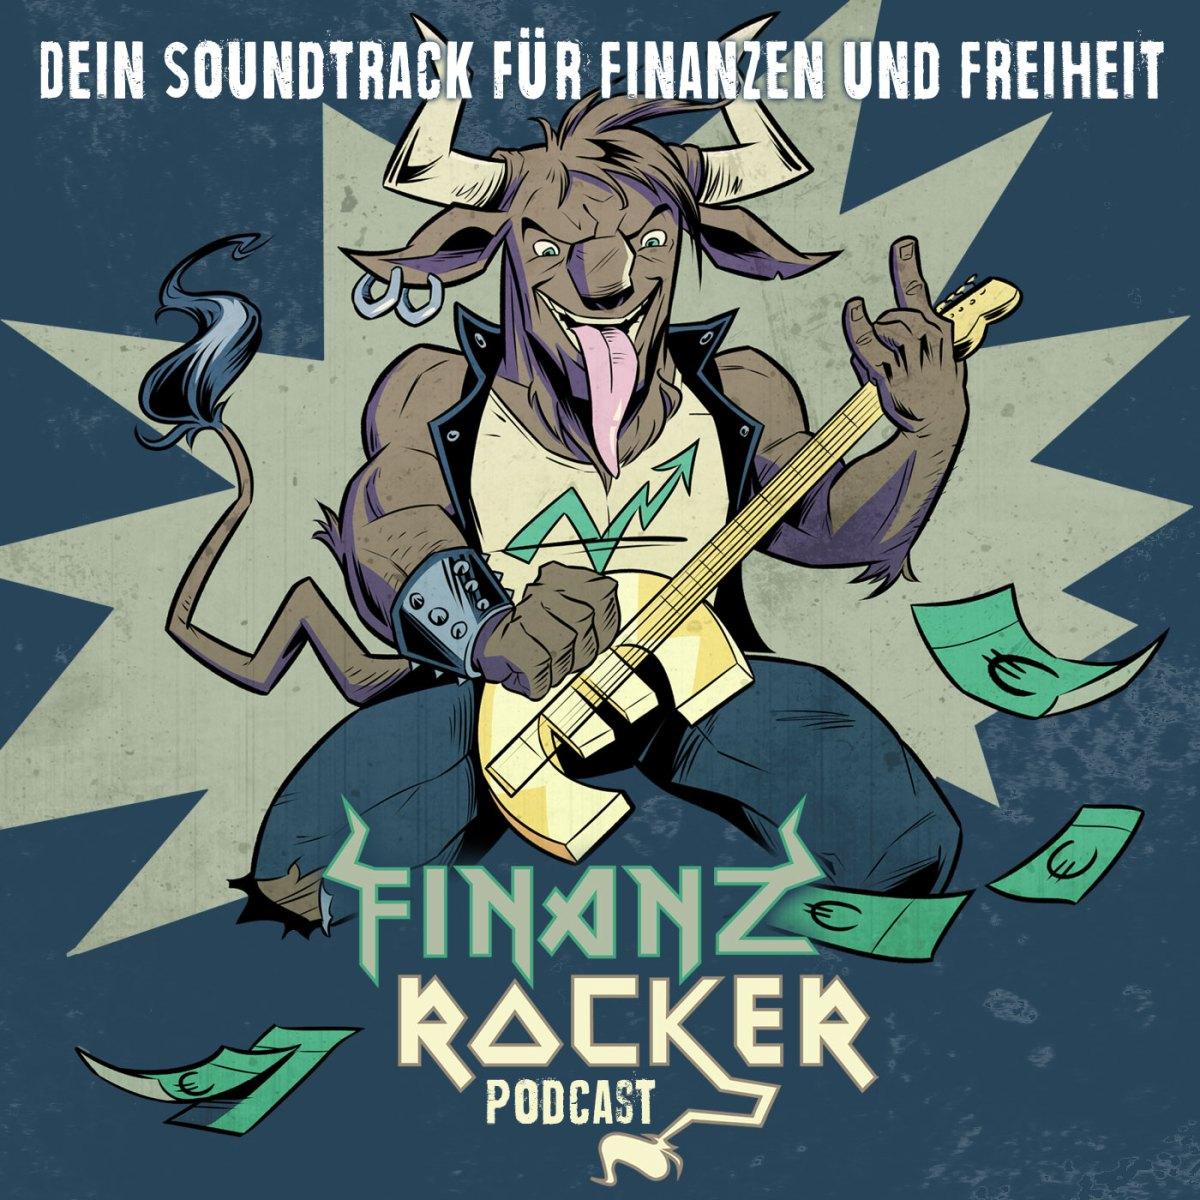 Divantis im Finanzrocker-Podcast zu Gast